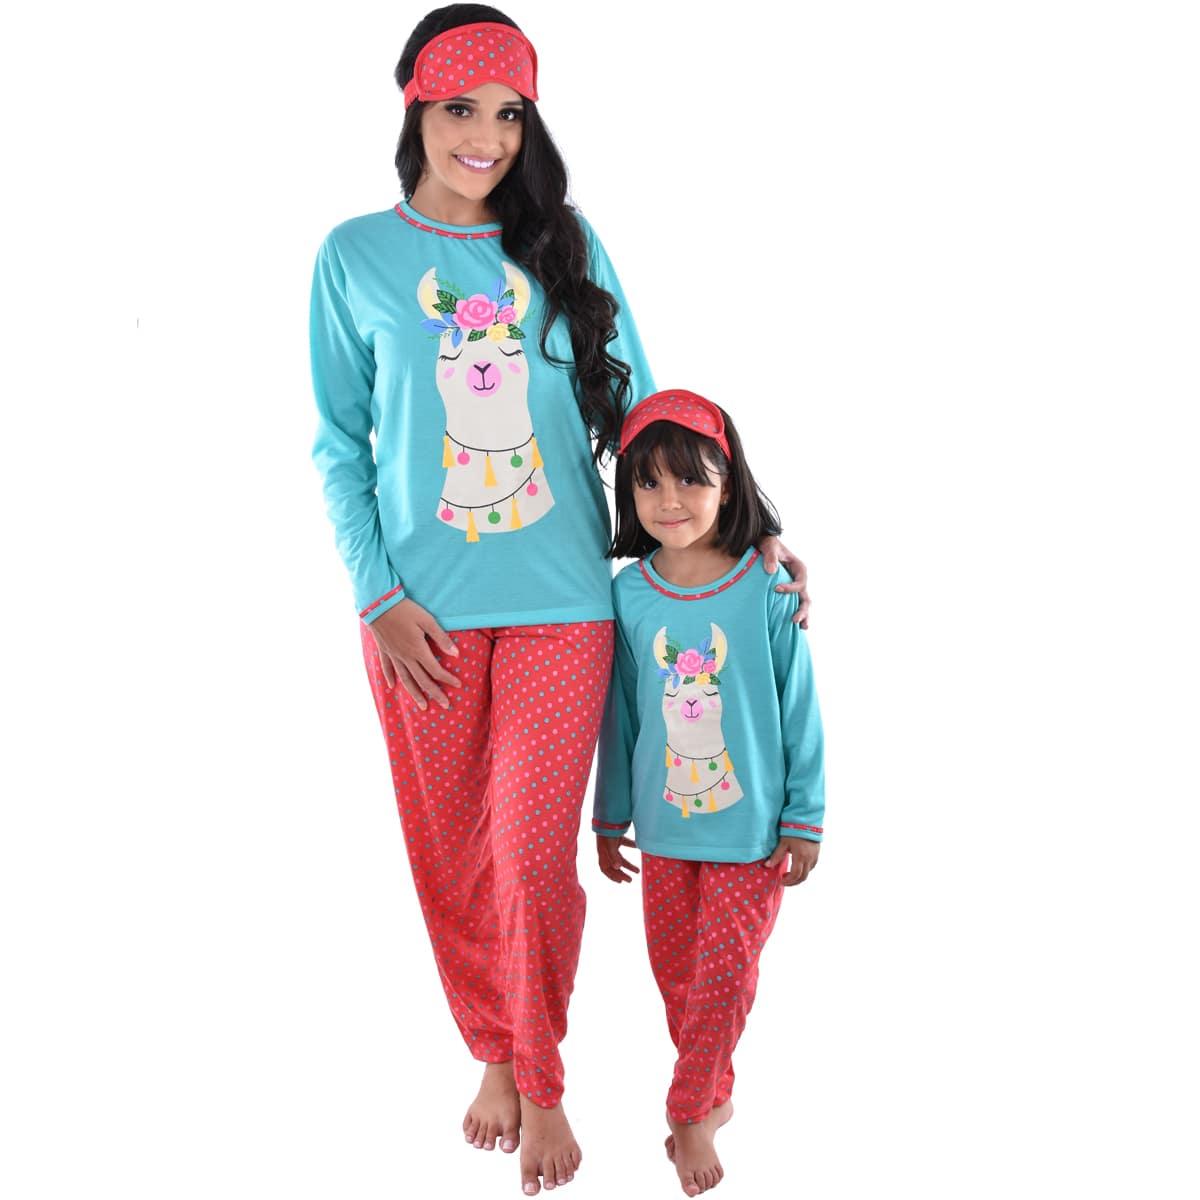 Pijama Longo Calça C/ Tapa Olho Feminino Adulto Estampa Desenho Lhama 310